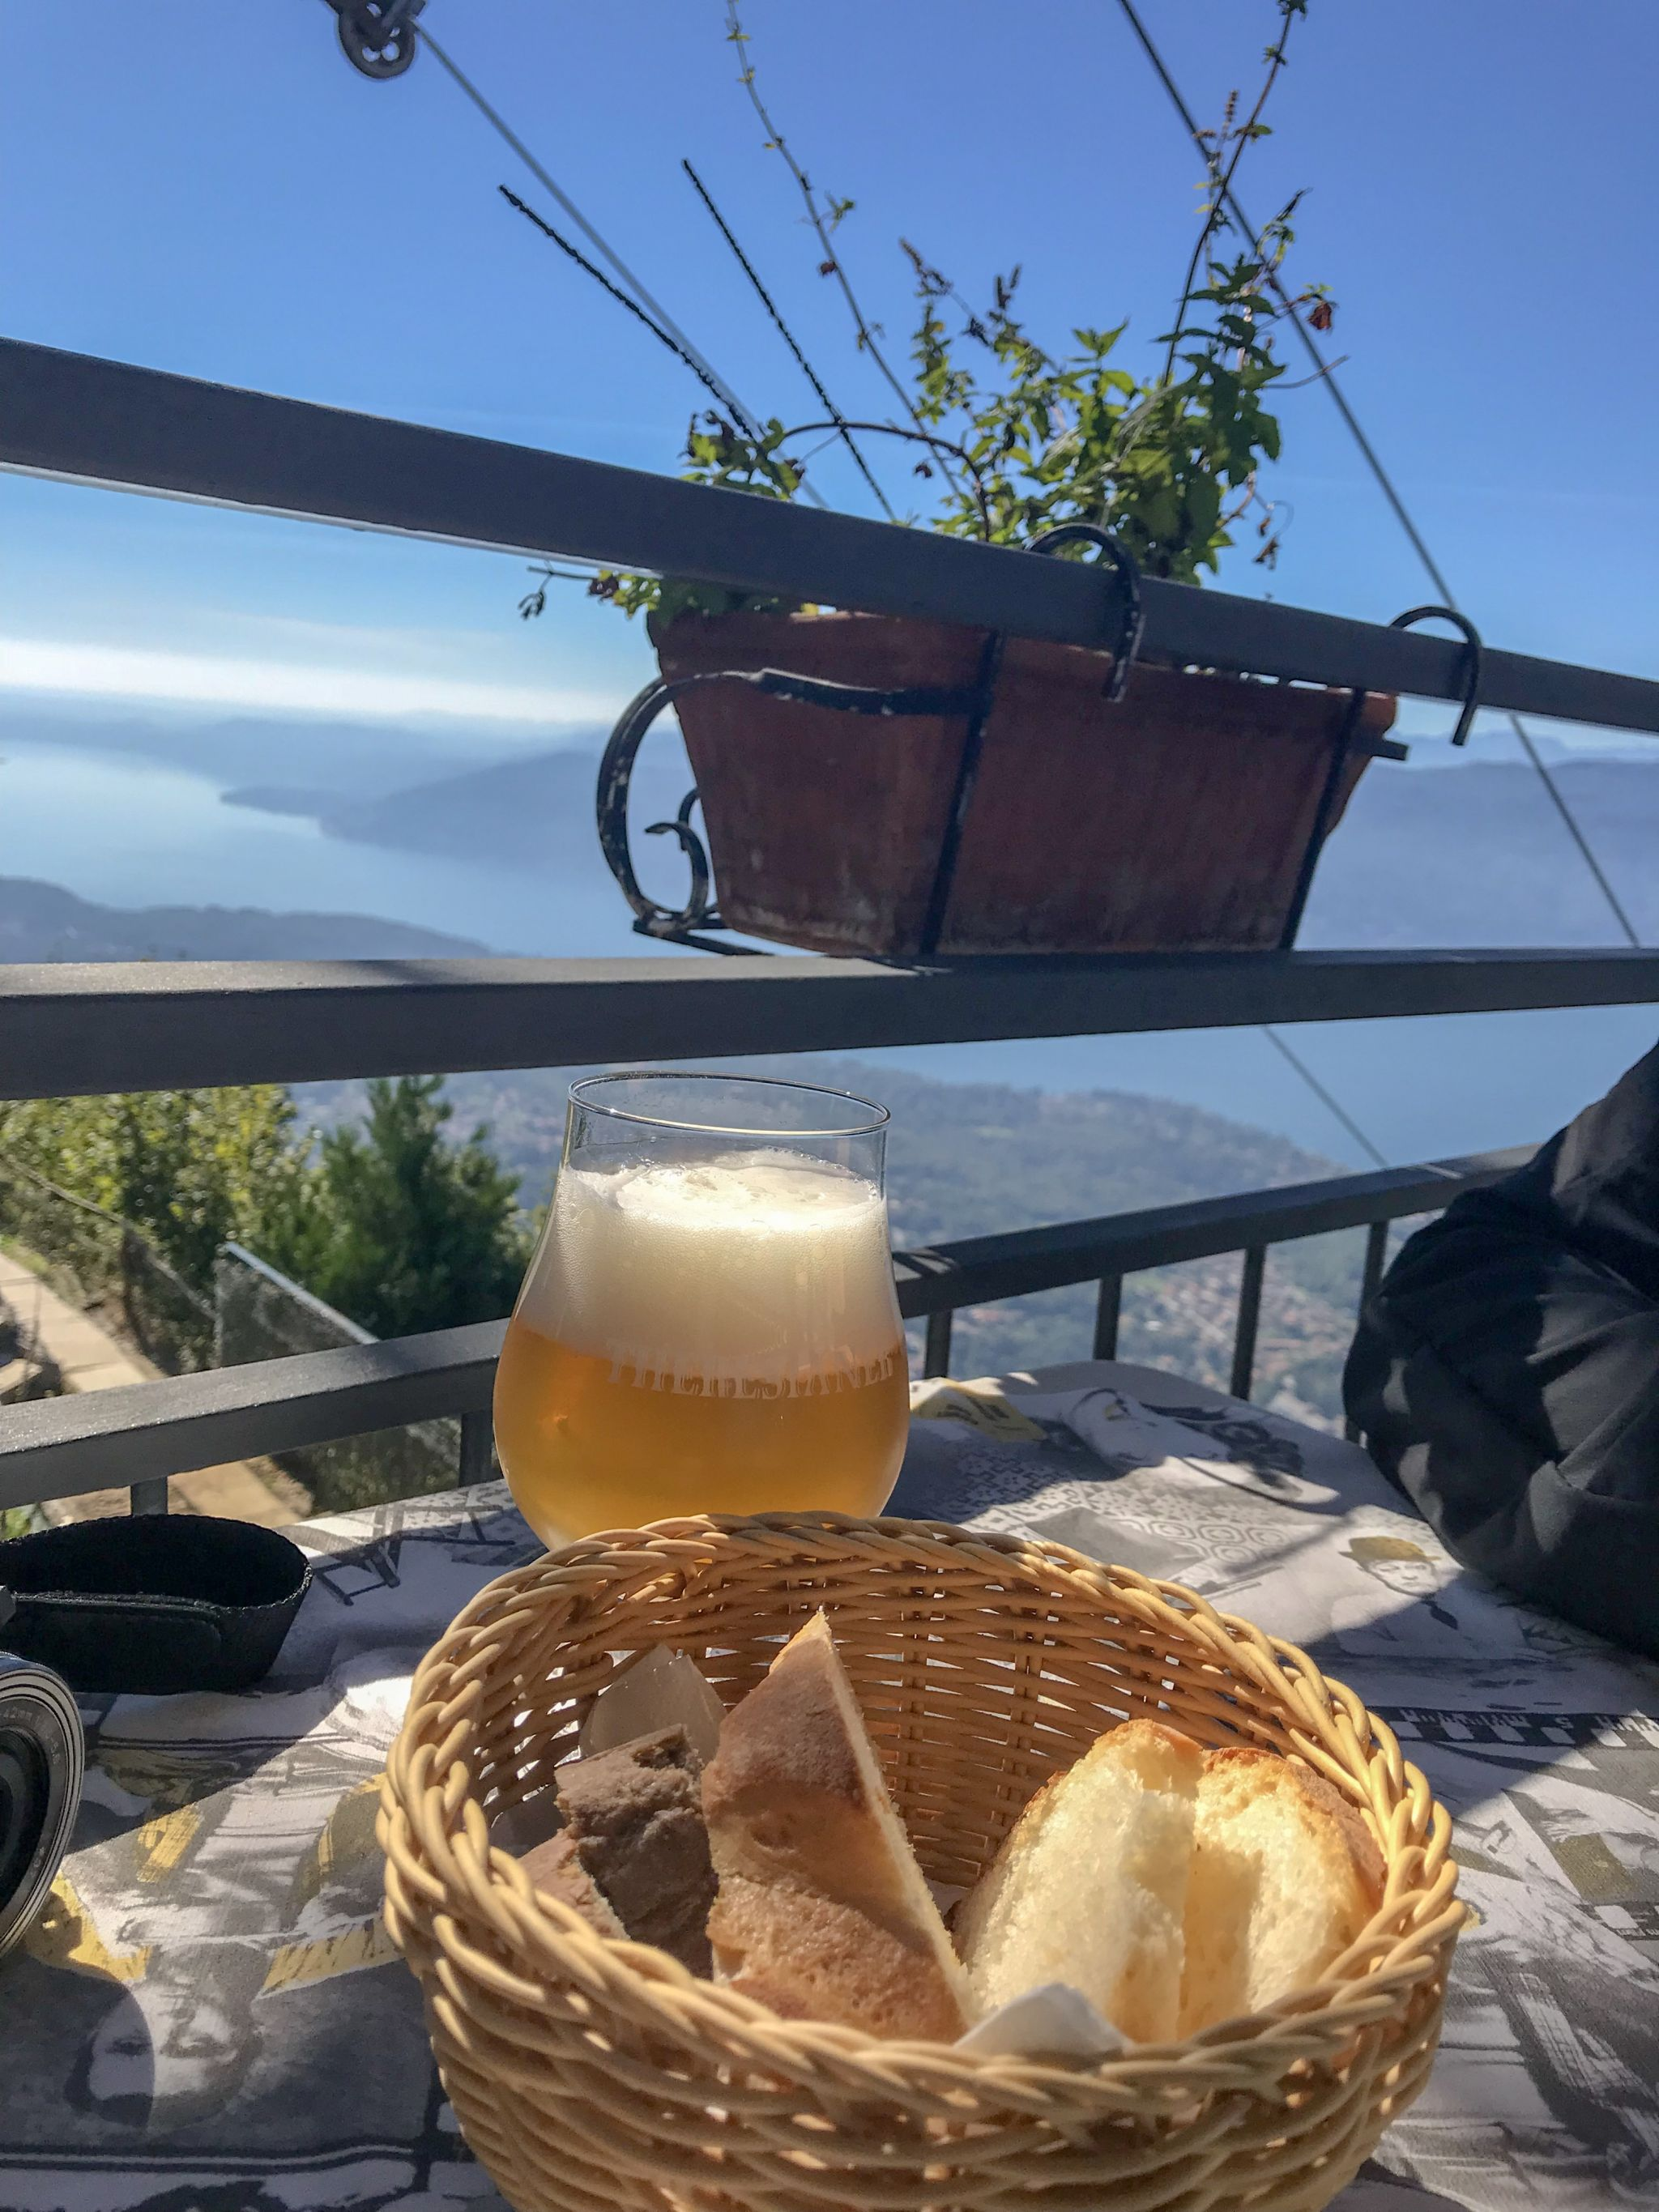 Bread and views at Panoramic Restaurant Lake Maggiore